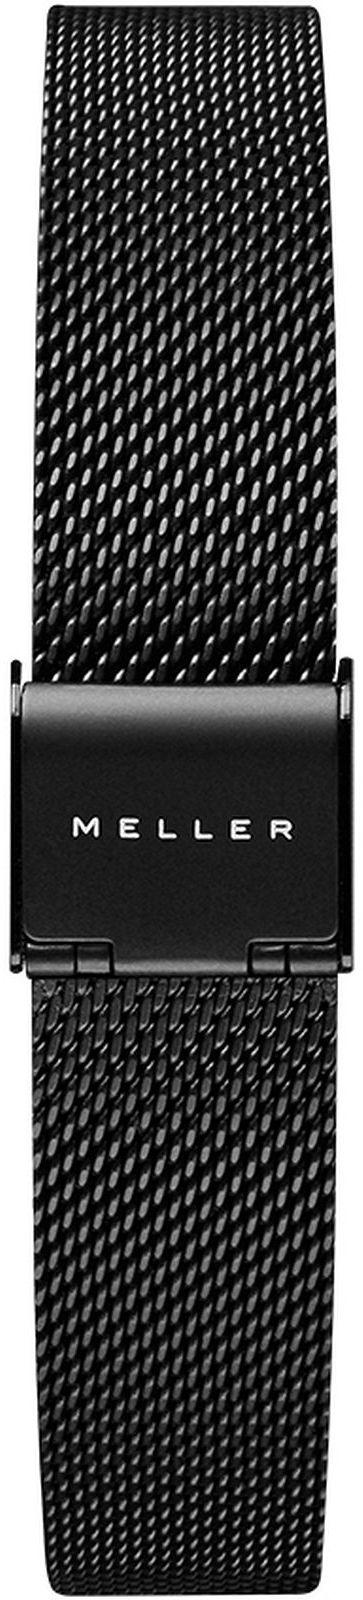 Bransoleta Meller Black Metal W 16 mm